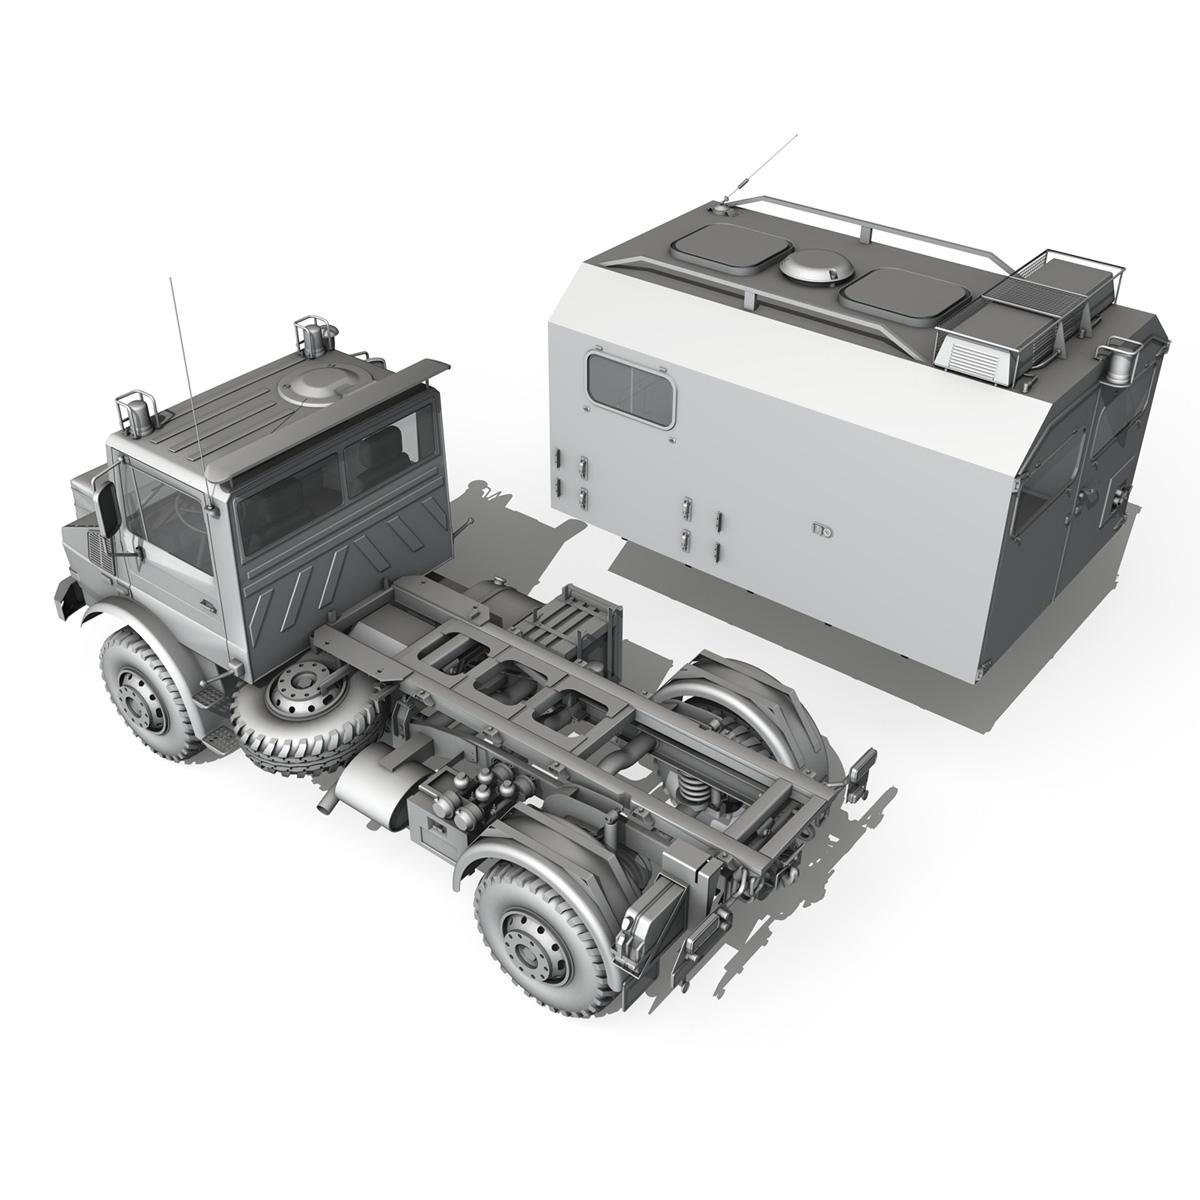 Unimog U1300l For Sale Upcomingcarshq Com